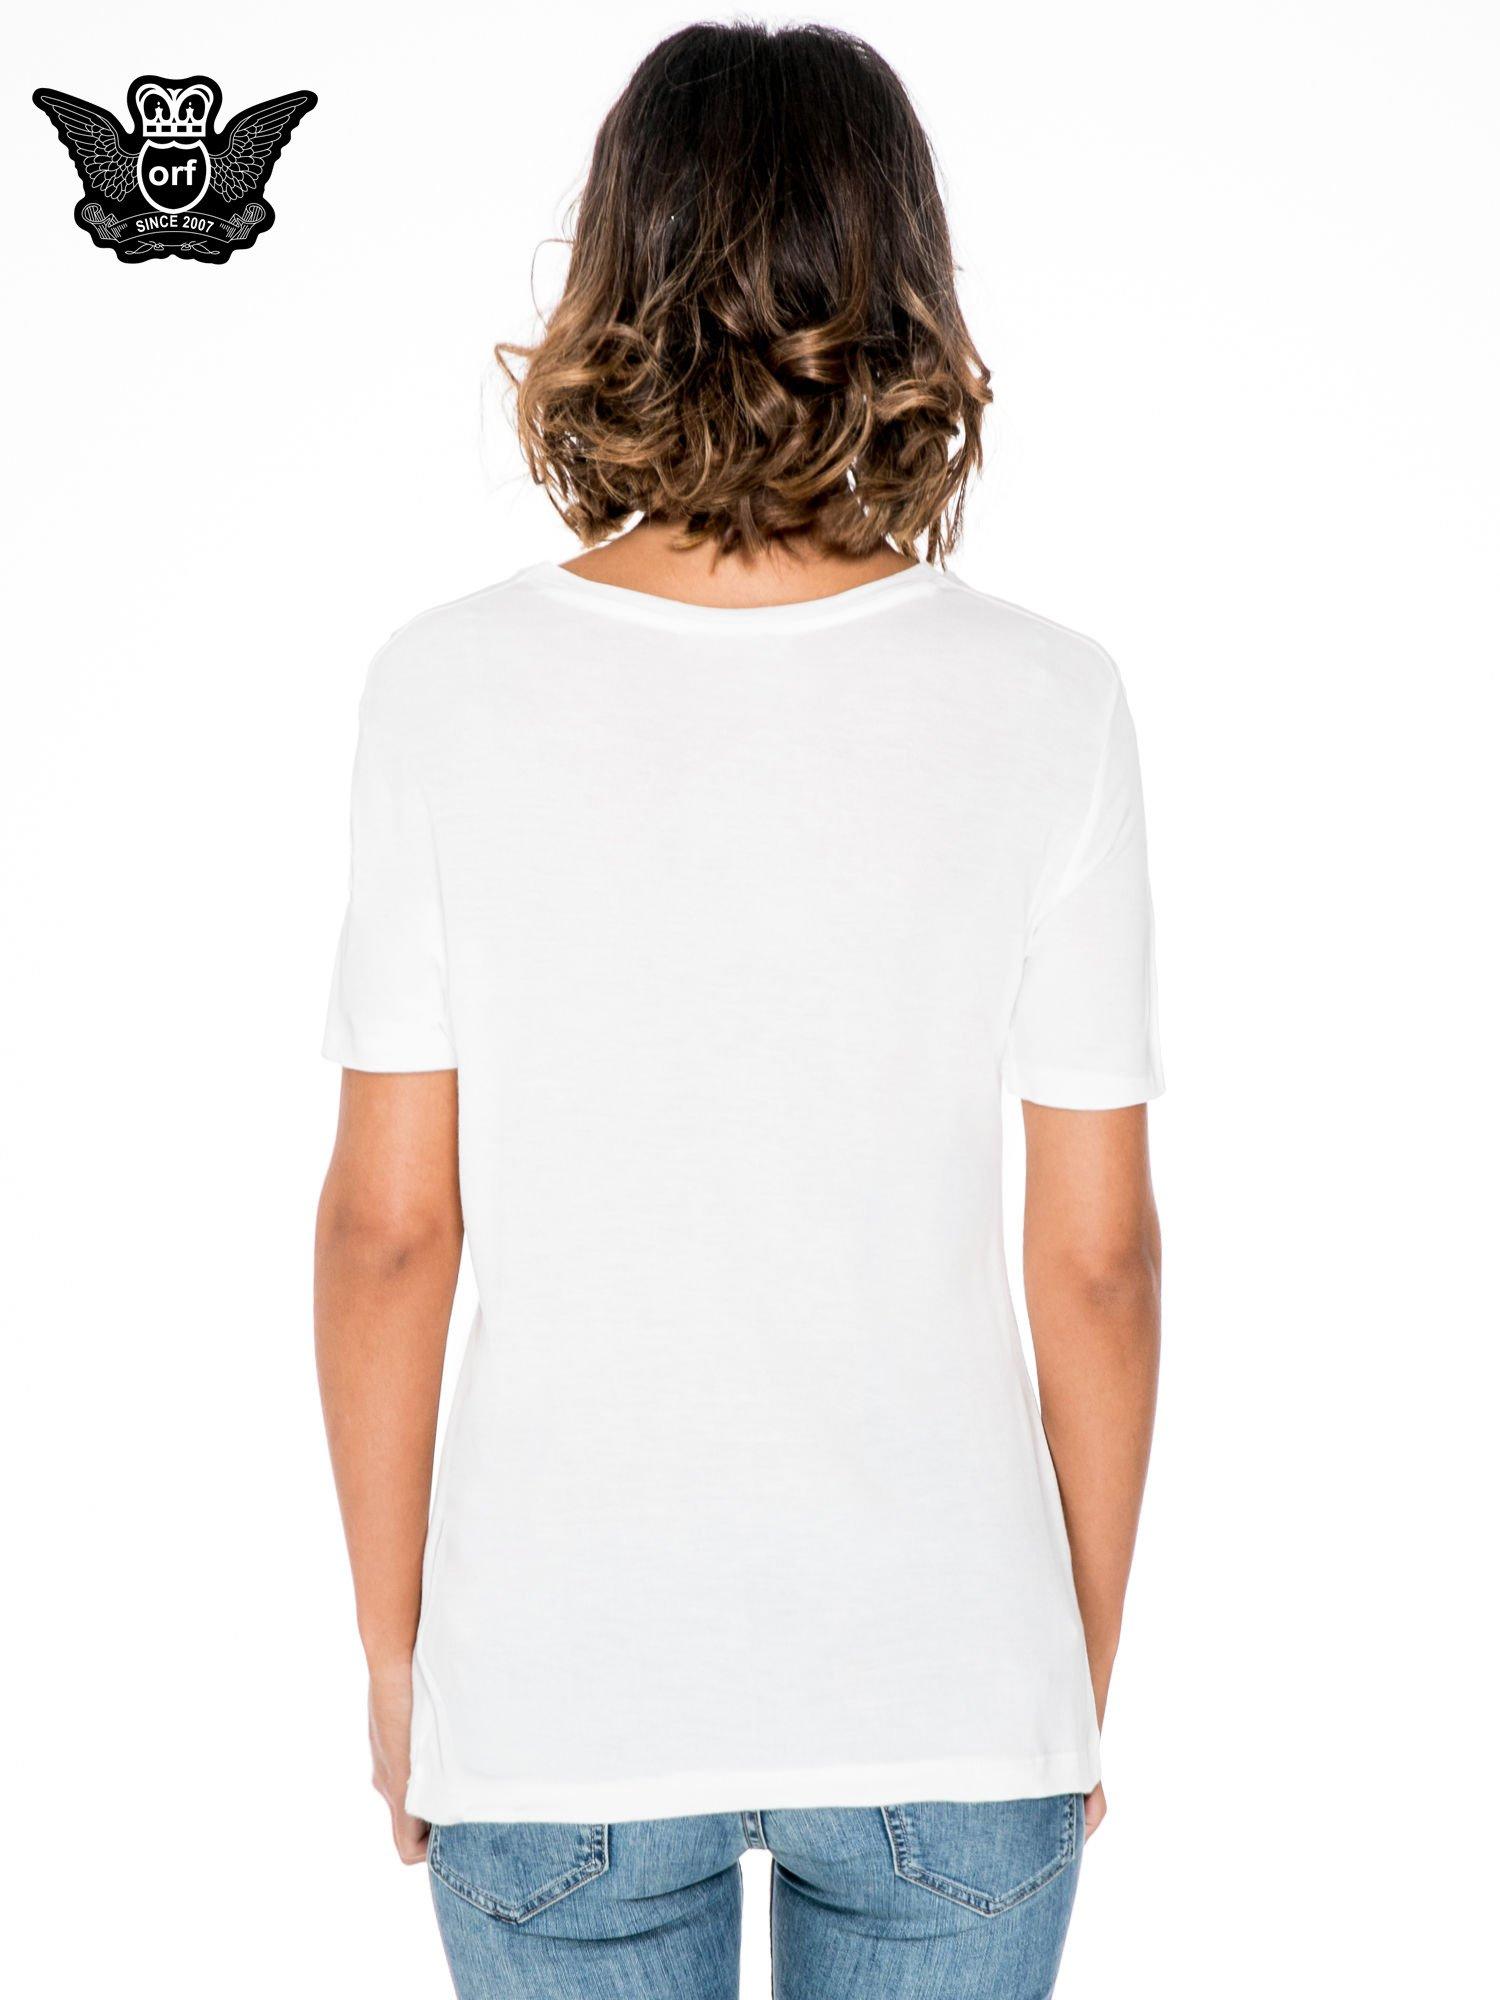 Biały t-shirt z napisem WARRIORS ROLLER SKATERS                                  zdj.                                  4